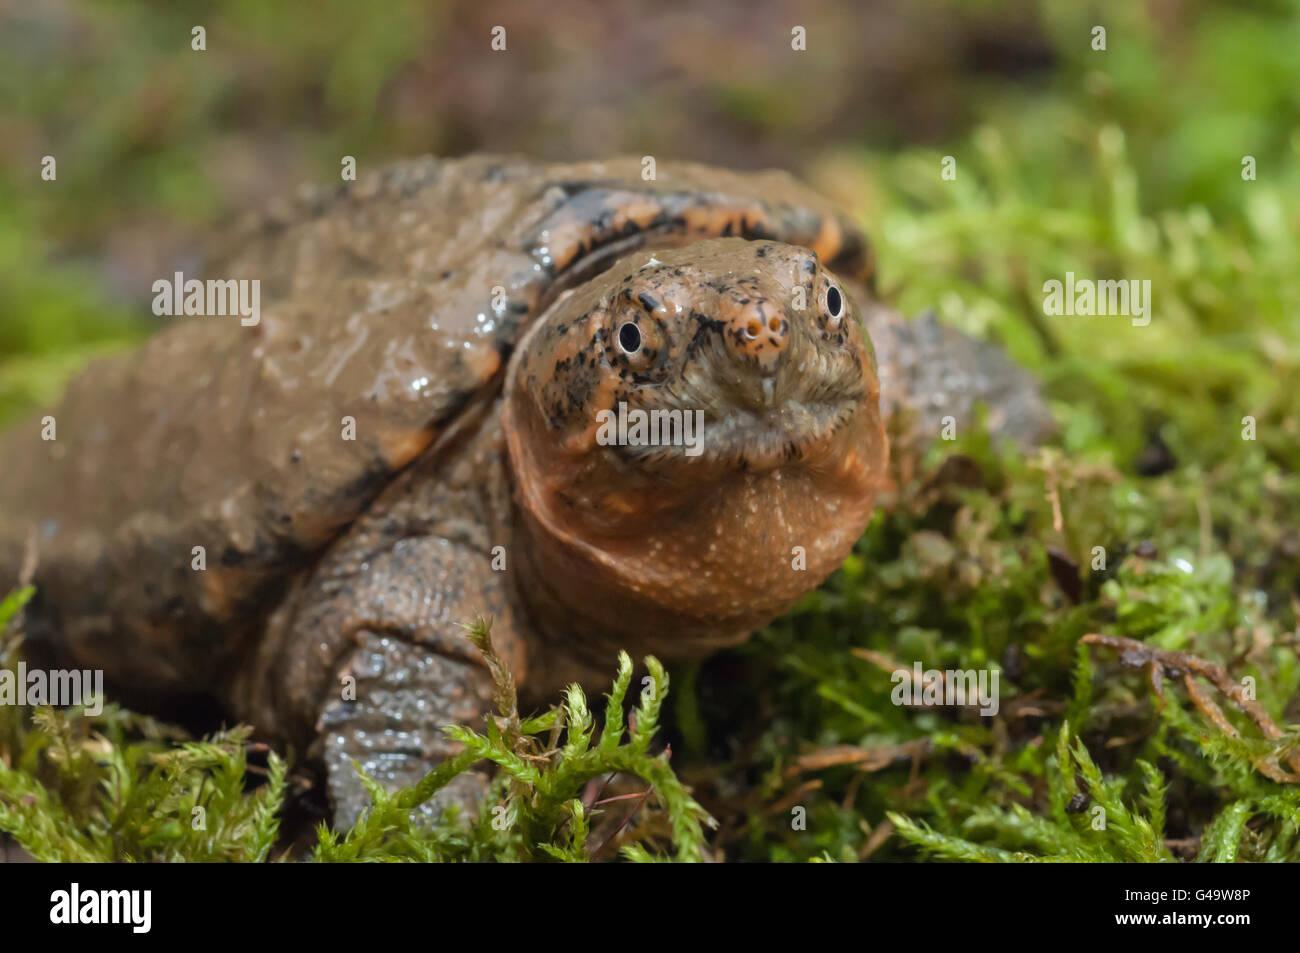 Common snapping turtle, Chelydra serpentina serpentina, juvenile Stock Photo